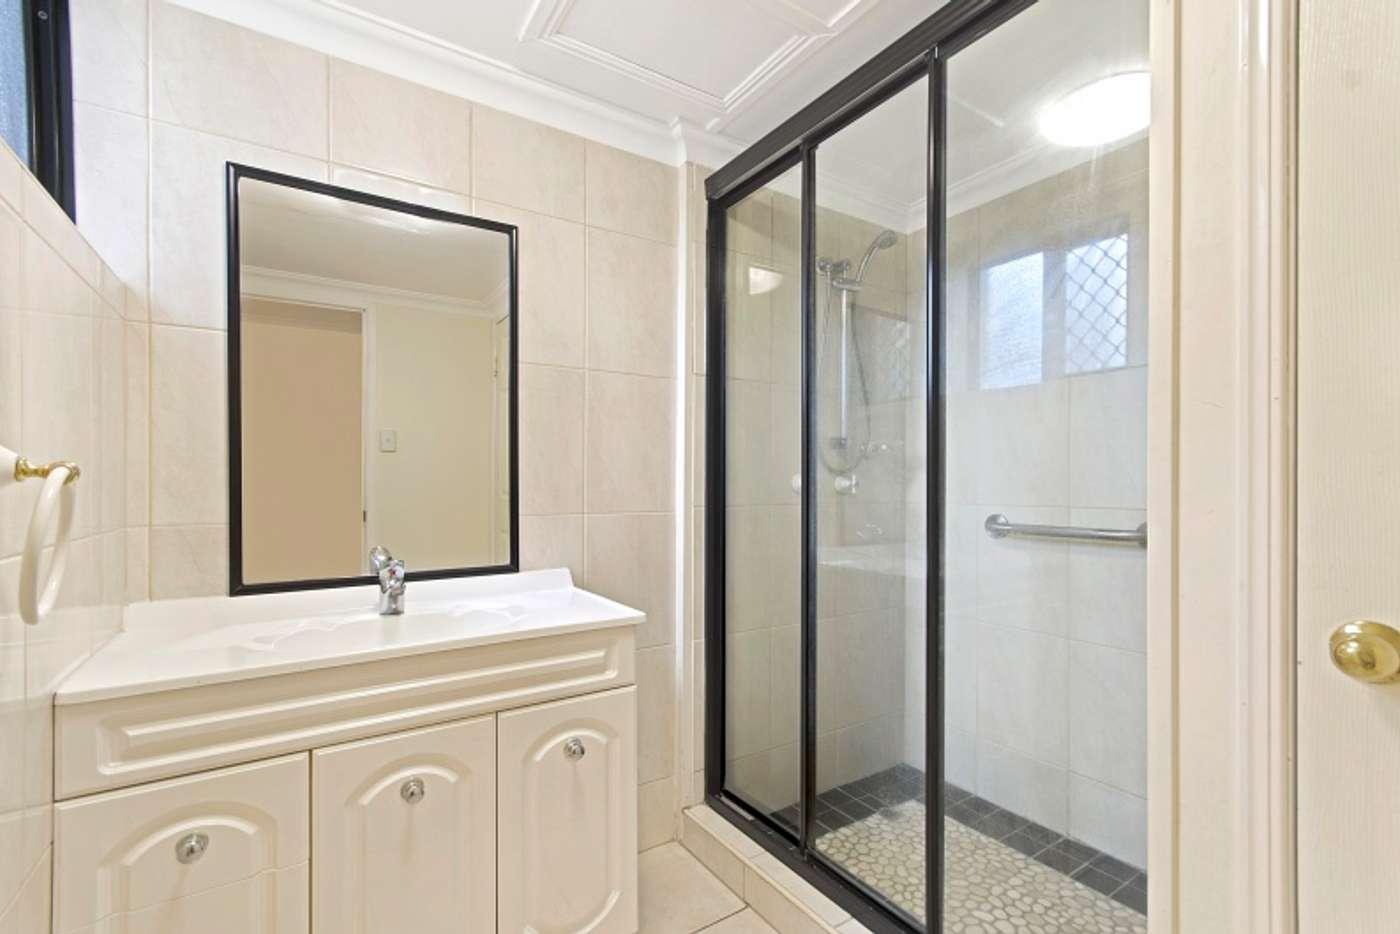 Sixth view of Homely unit listing, 1/7 Warburton Street, North Ward QLD 4810